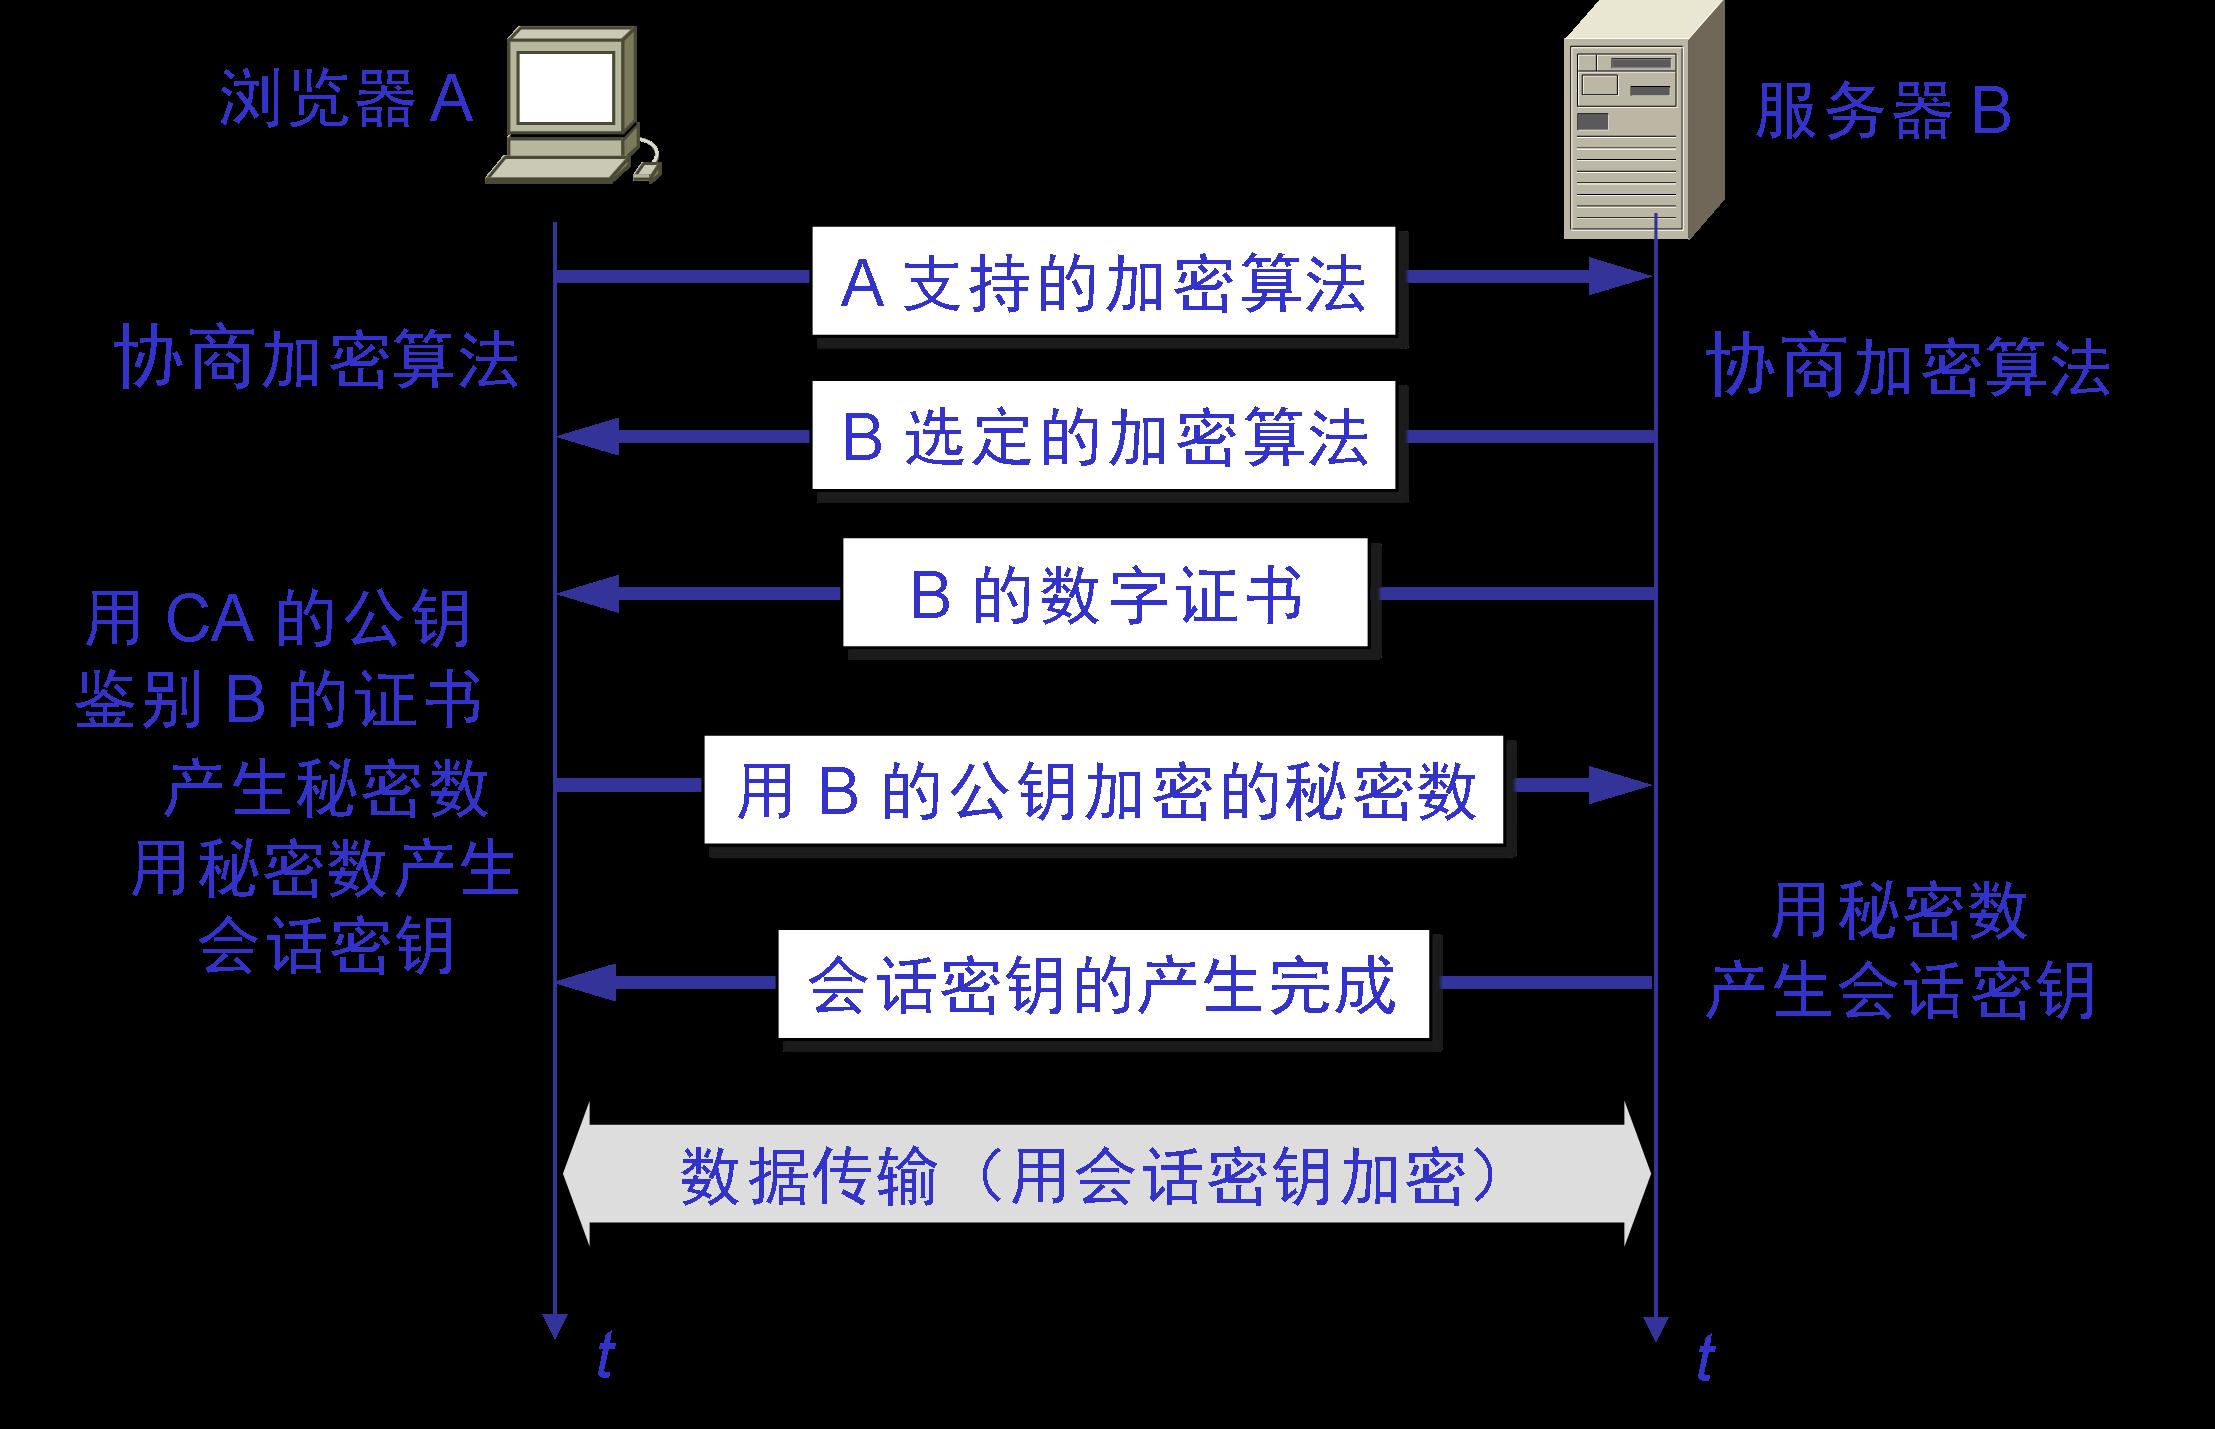 SSL安全会话建立过程 | 《计算机网络》